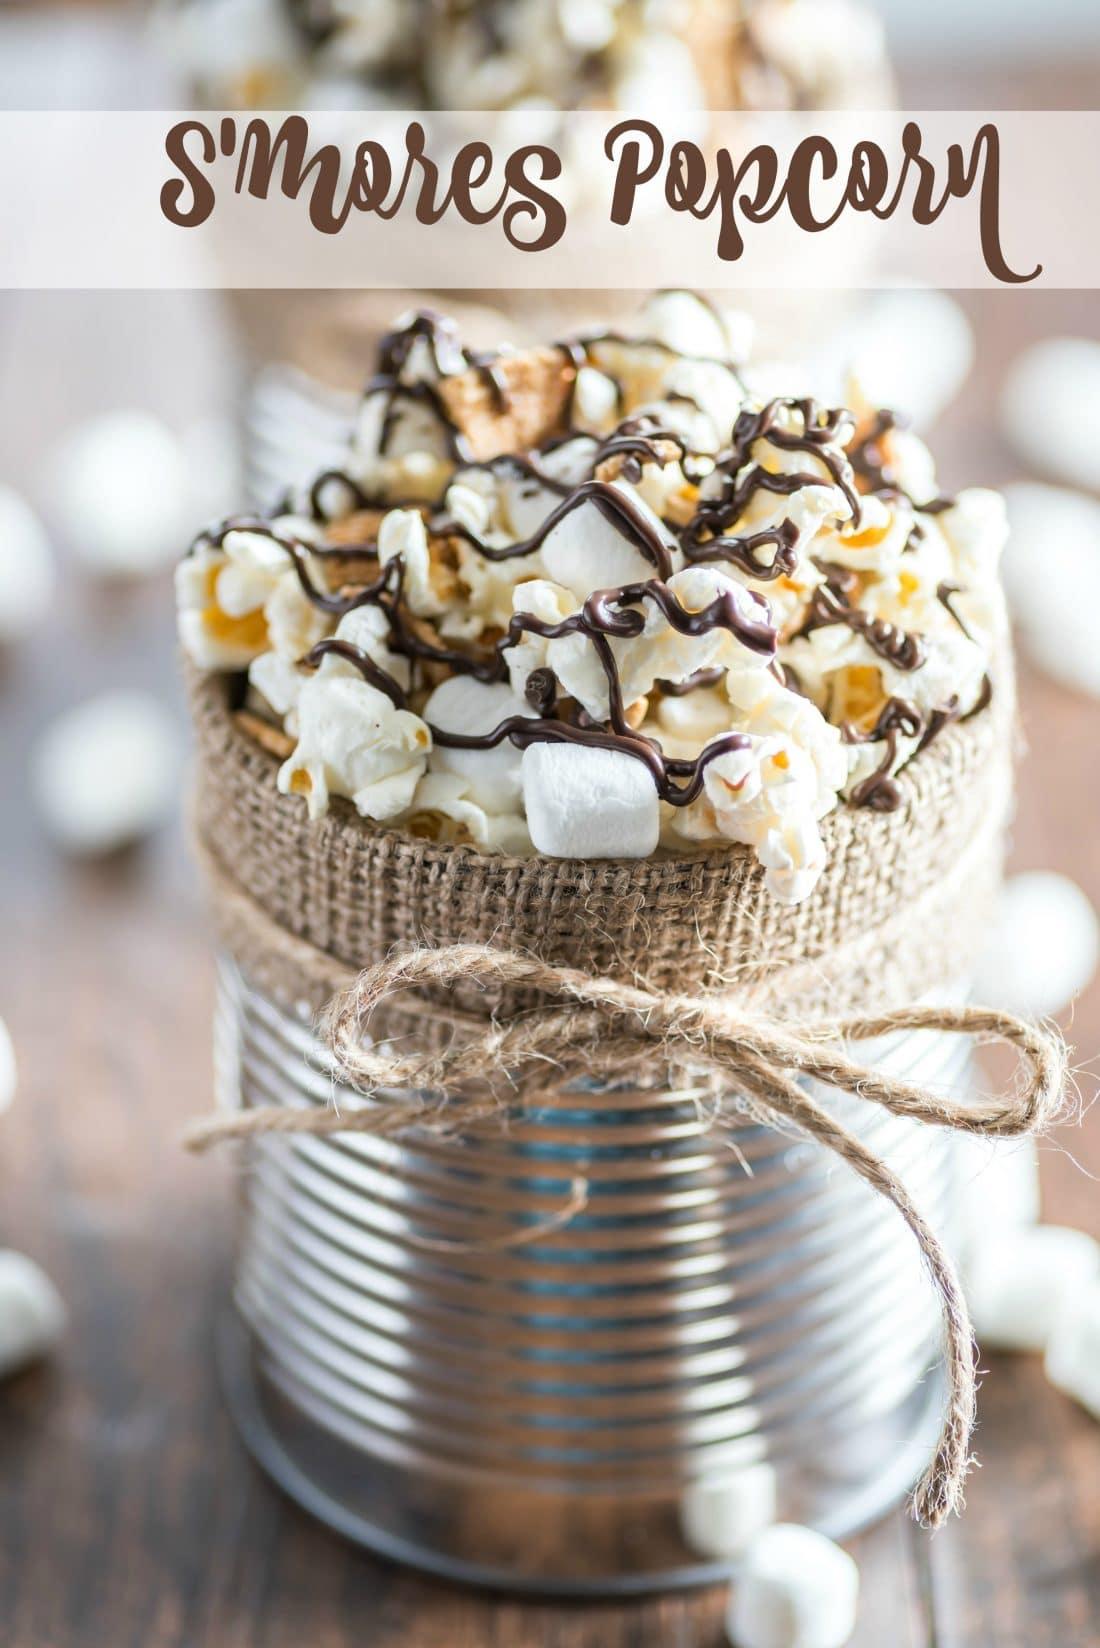 Smore's Popcorn Recipe